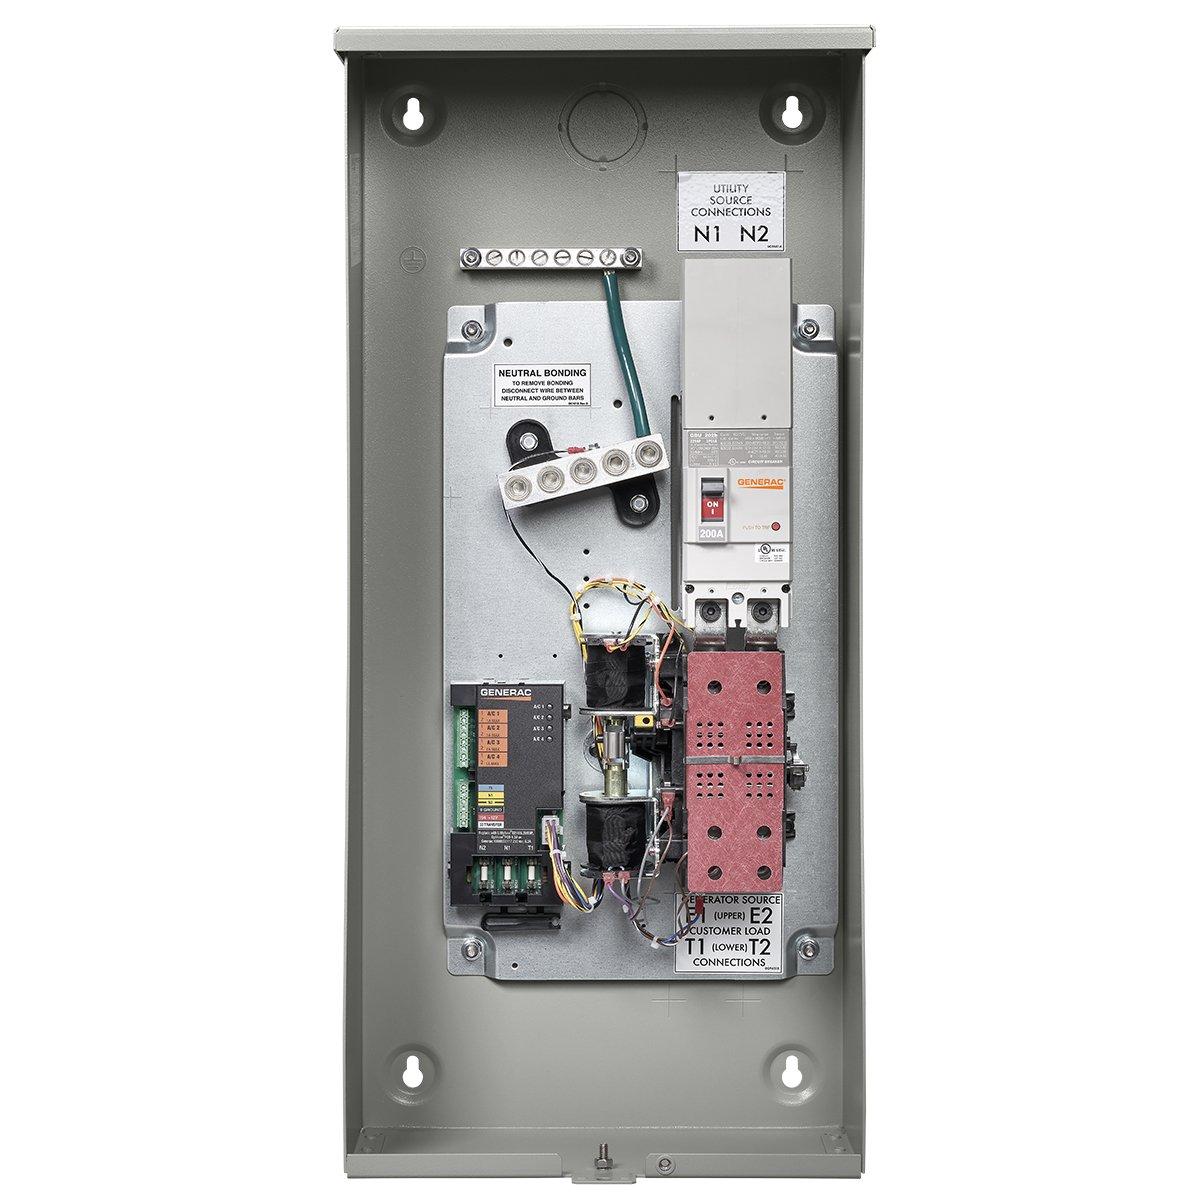 Amazon.com: Generac RXSW200A3 200 AMP Smart Transfer Switch: Garden &  OutdoorAmazon.com